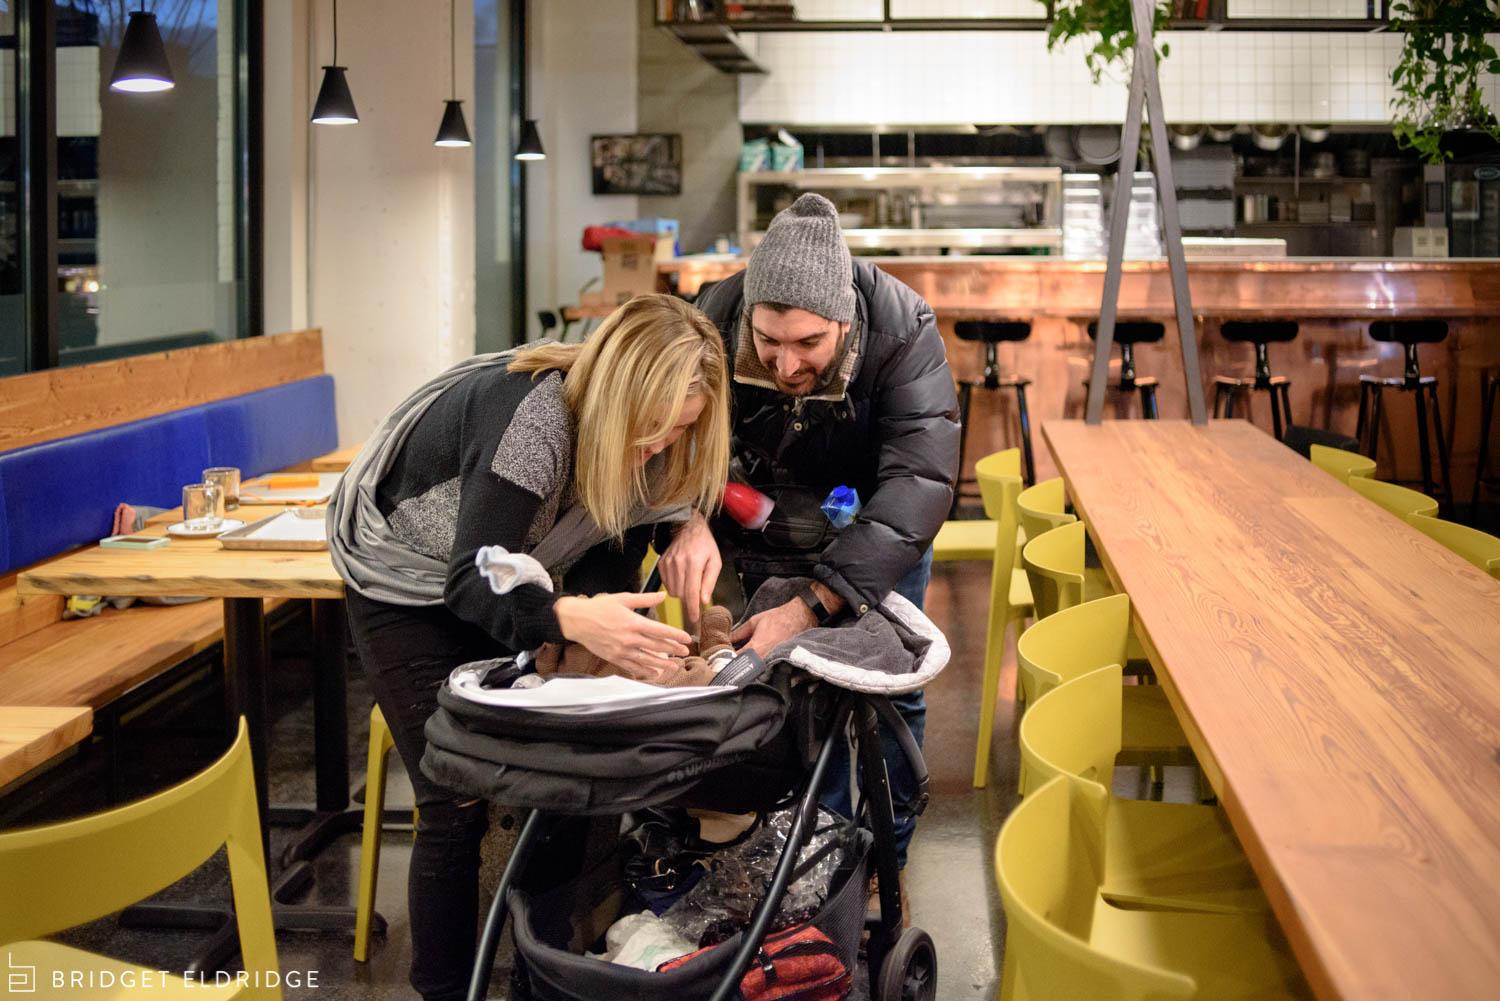 parents strap newborn baby into his stroller